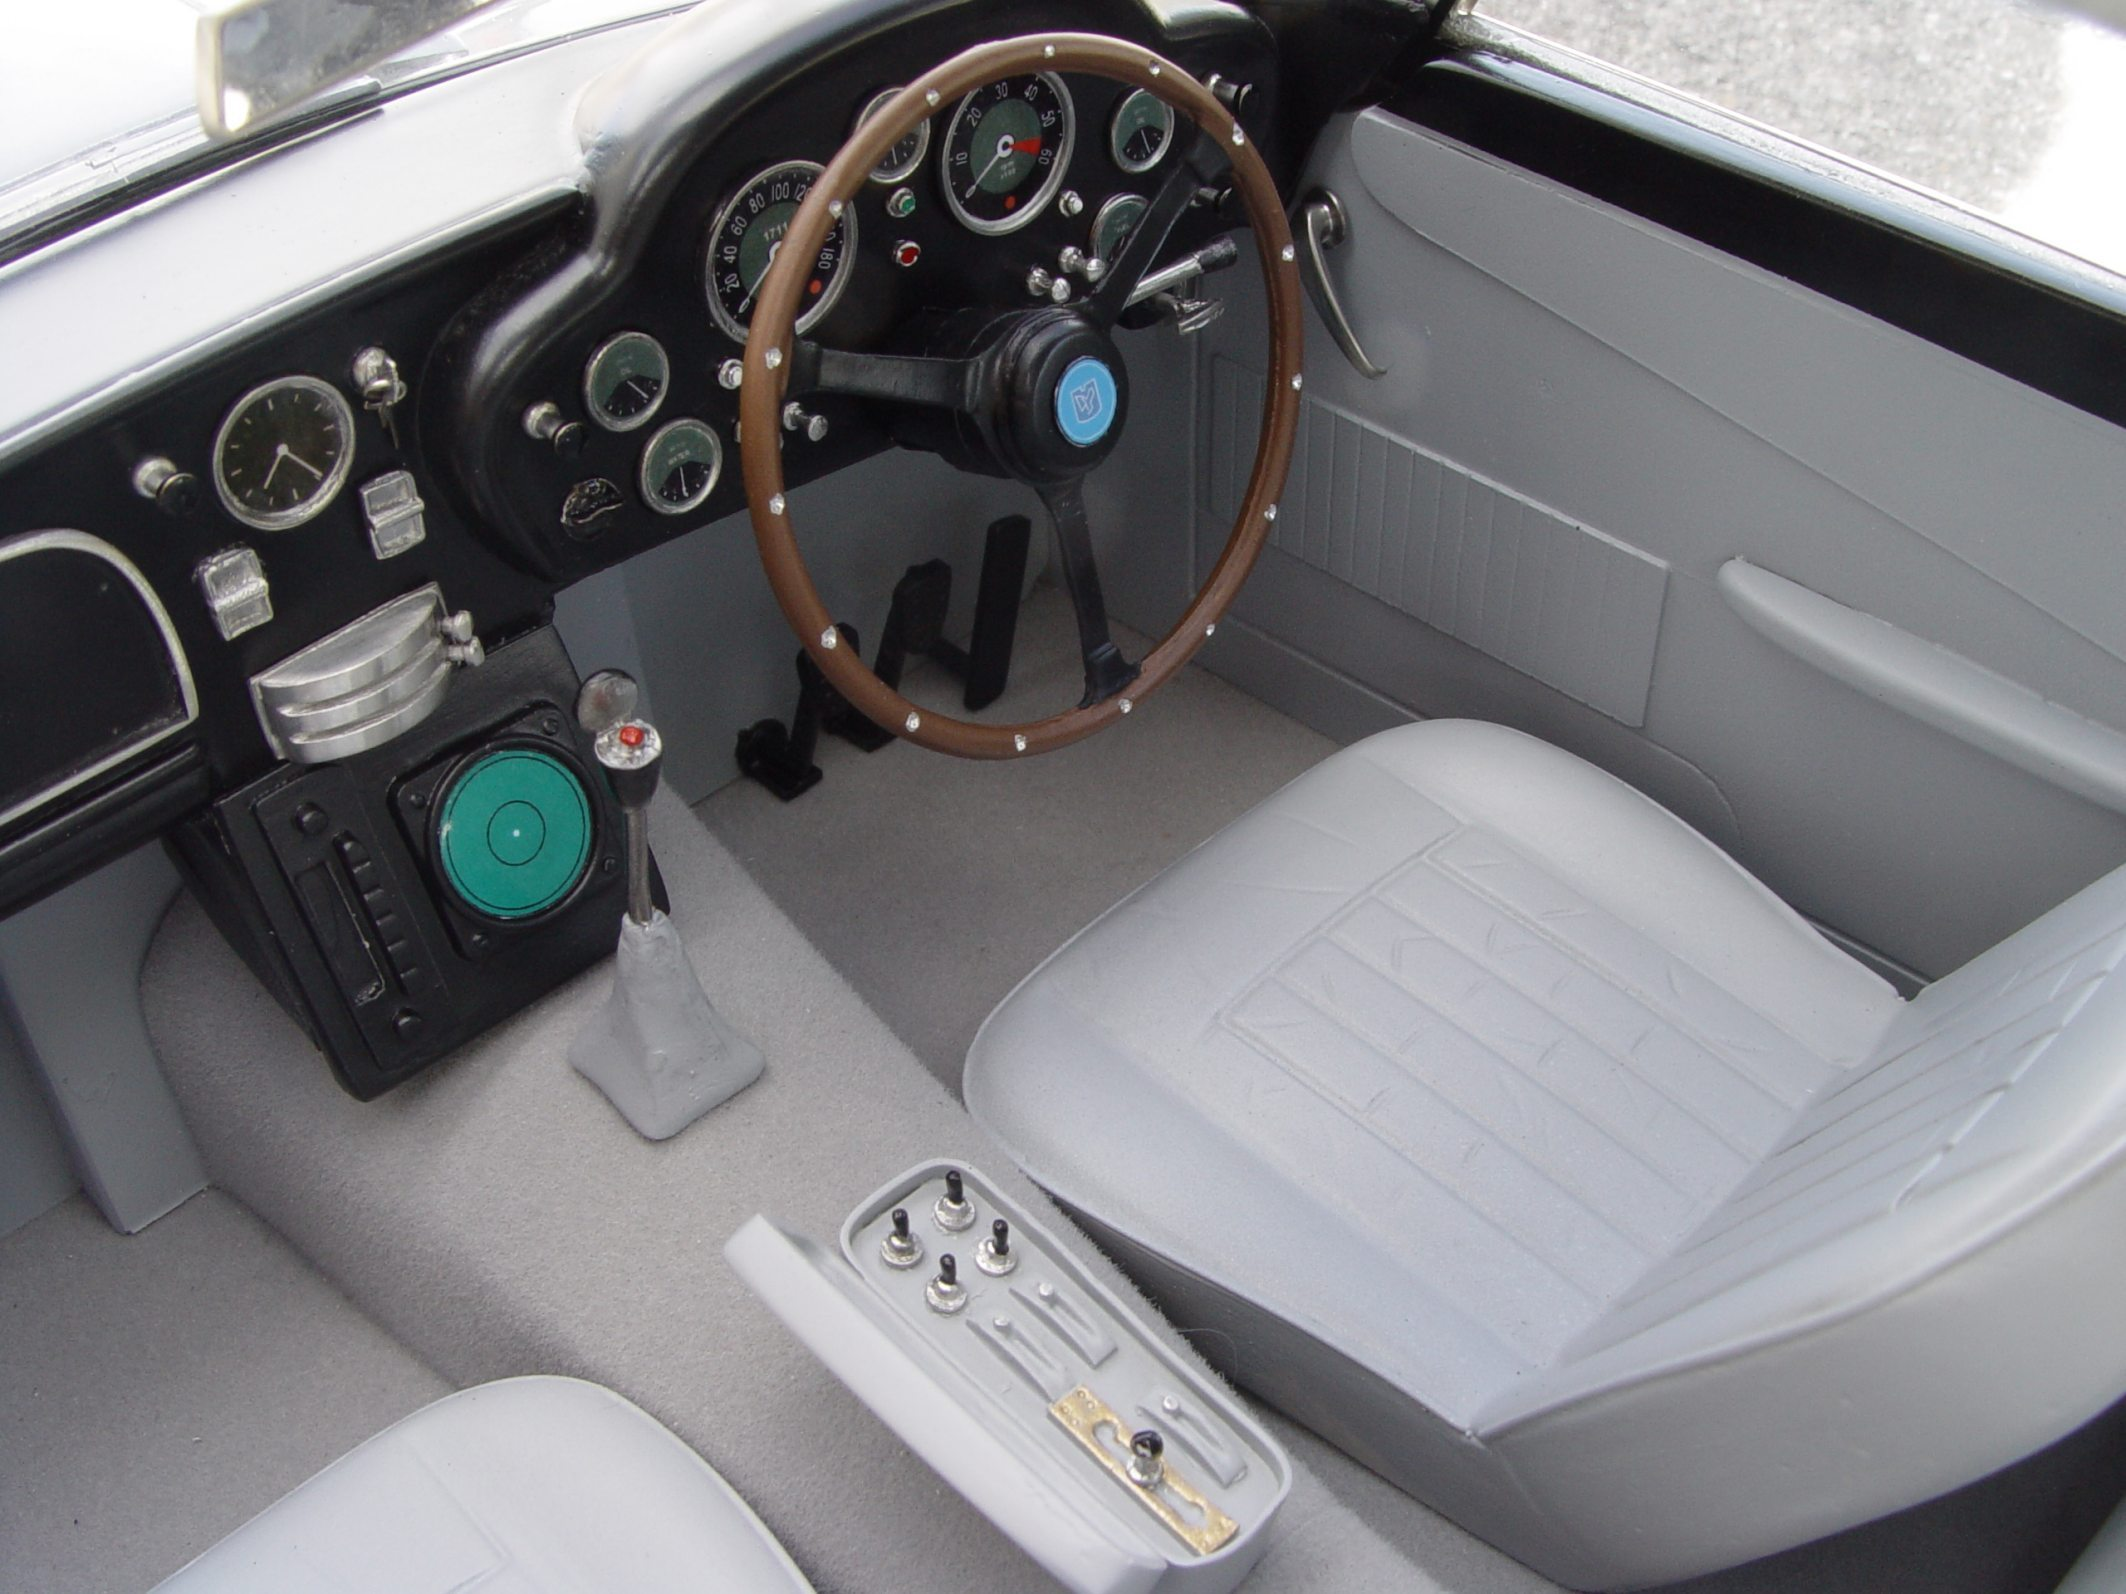 Aston Martin DB5 JB 007 1:8 - Page 2 1-8_Aston_Martin_James_Bond_Diamond_Cars_interieur01